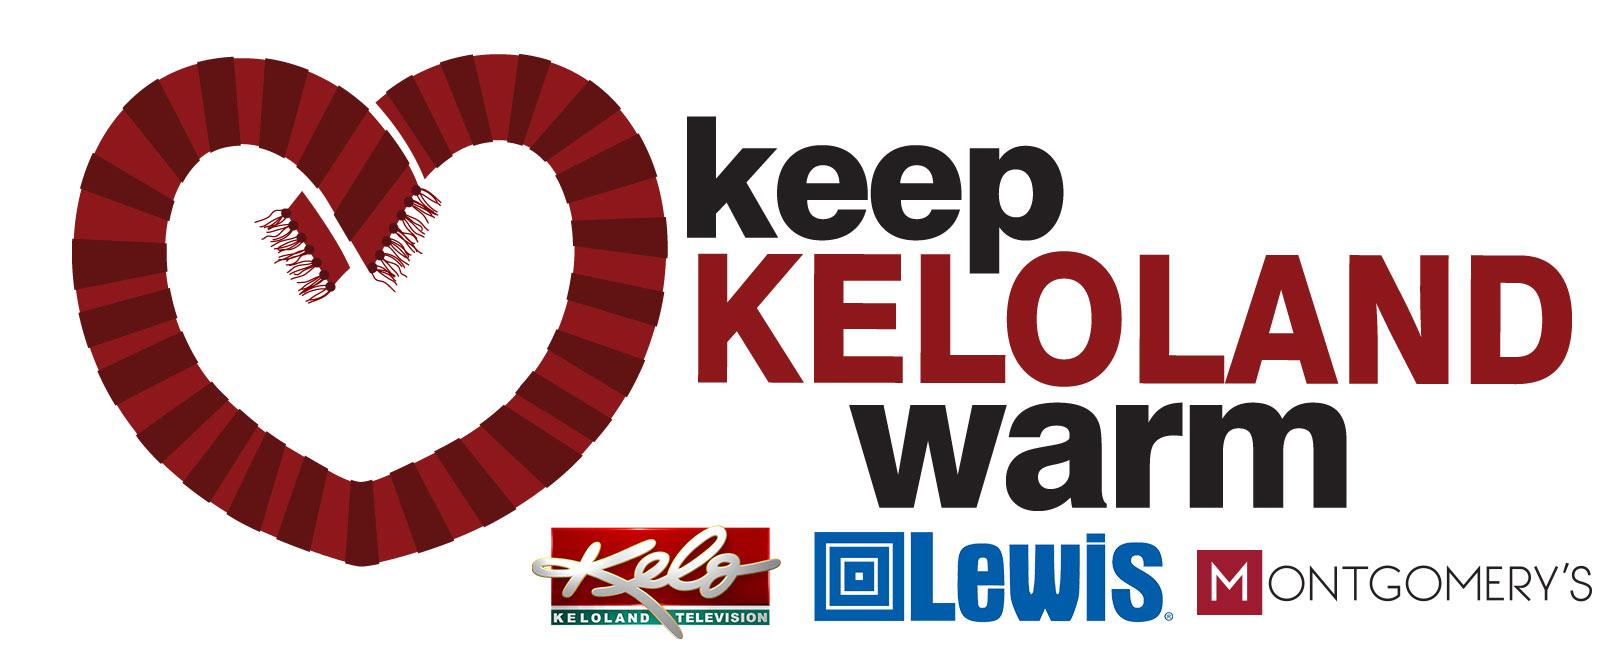 Keep KELOLAND Warm